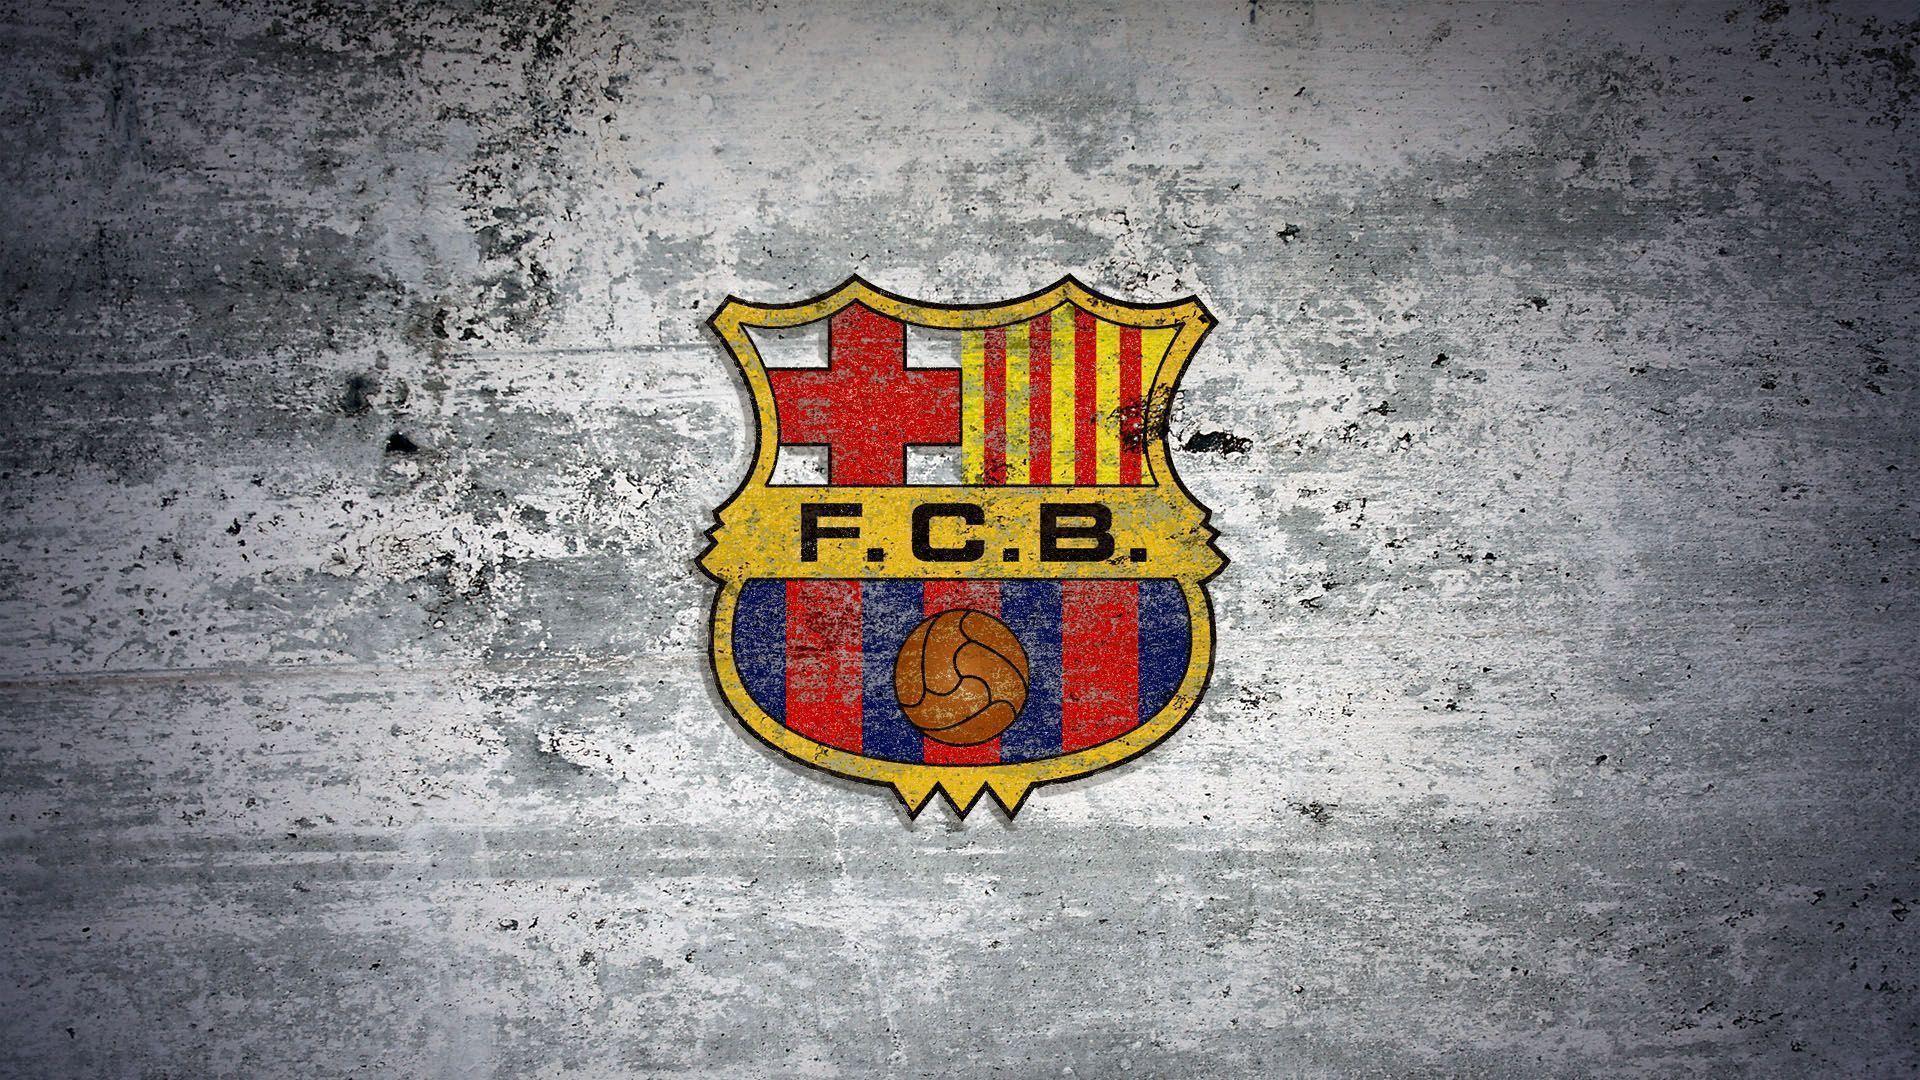 Barca Logo 1920x1080 wallpaper